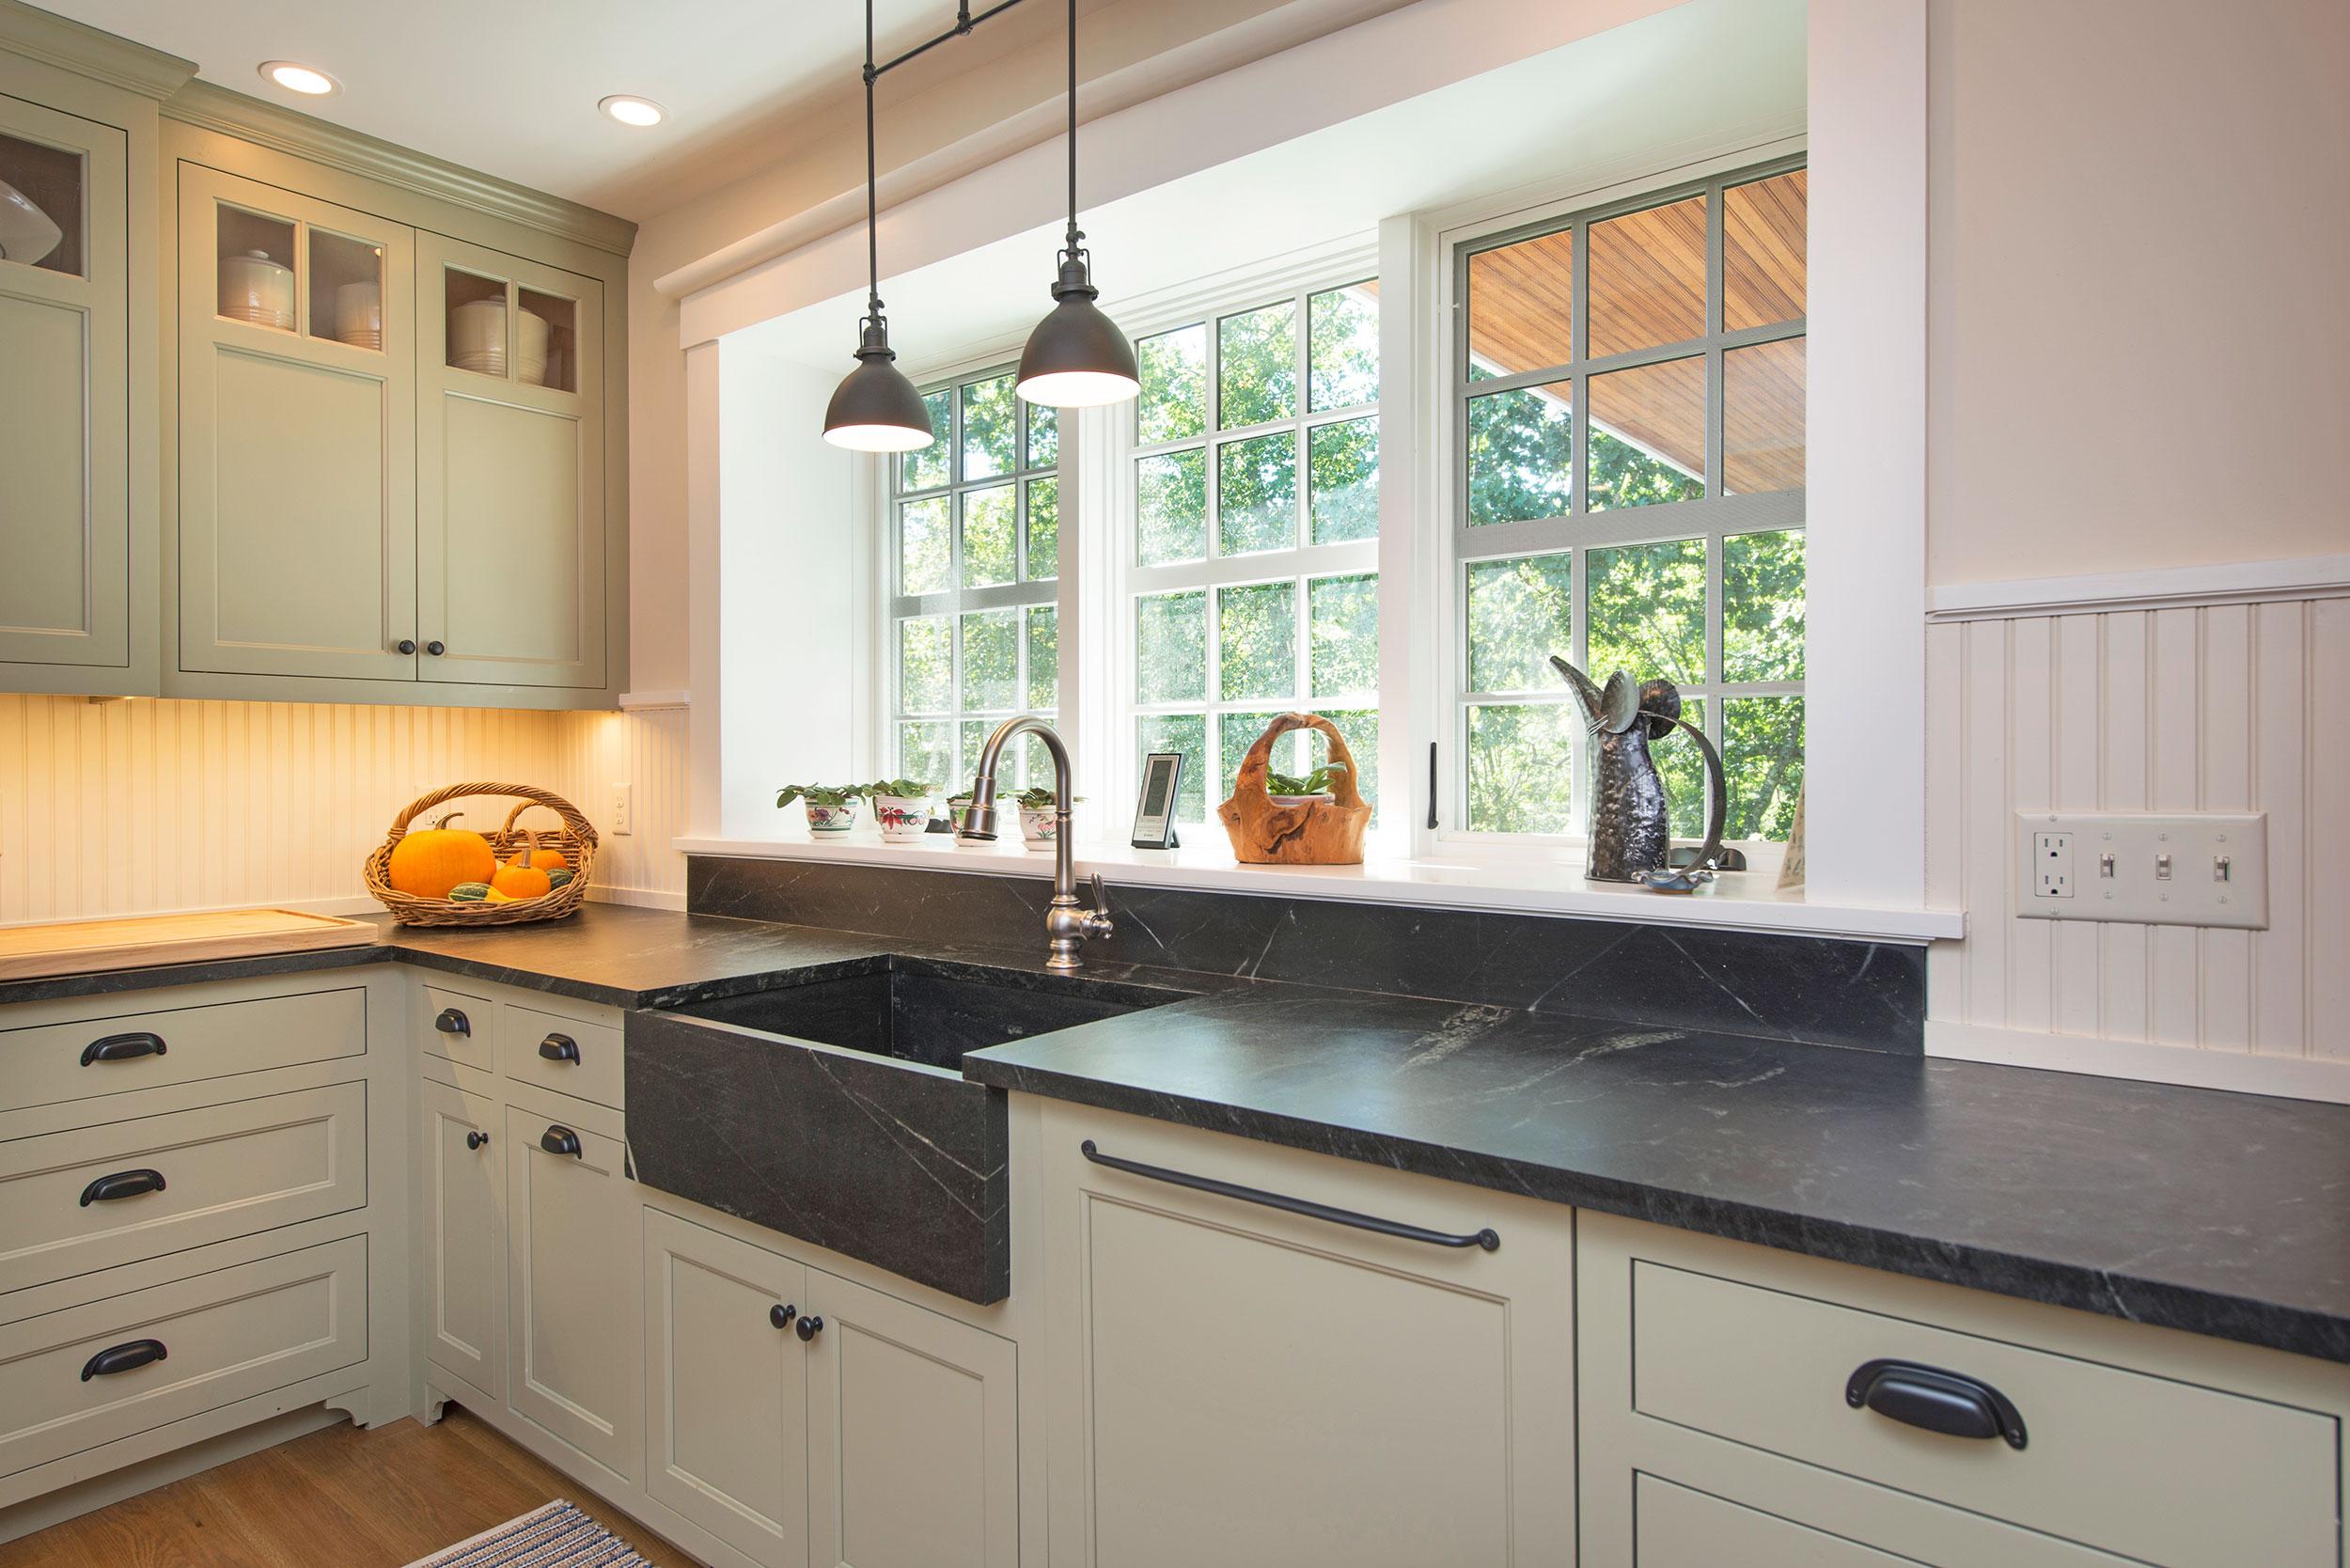 Remodeled-historic-kitchen_DSC0071.jpg